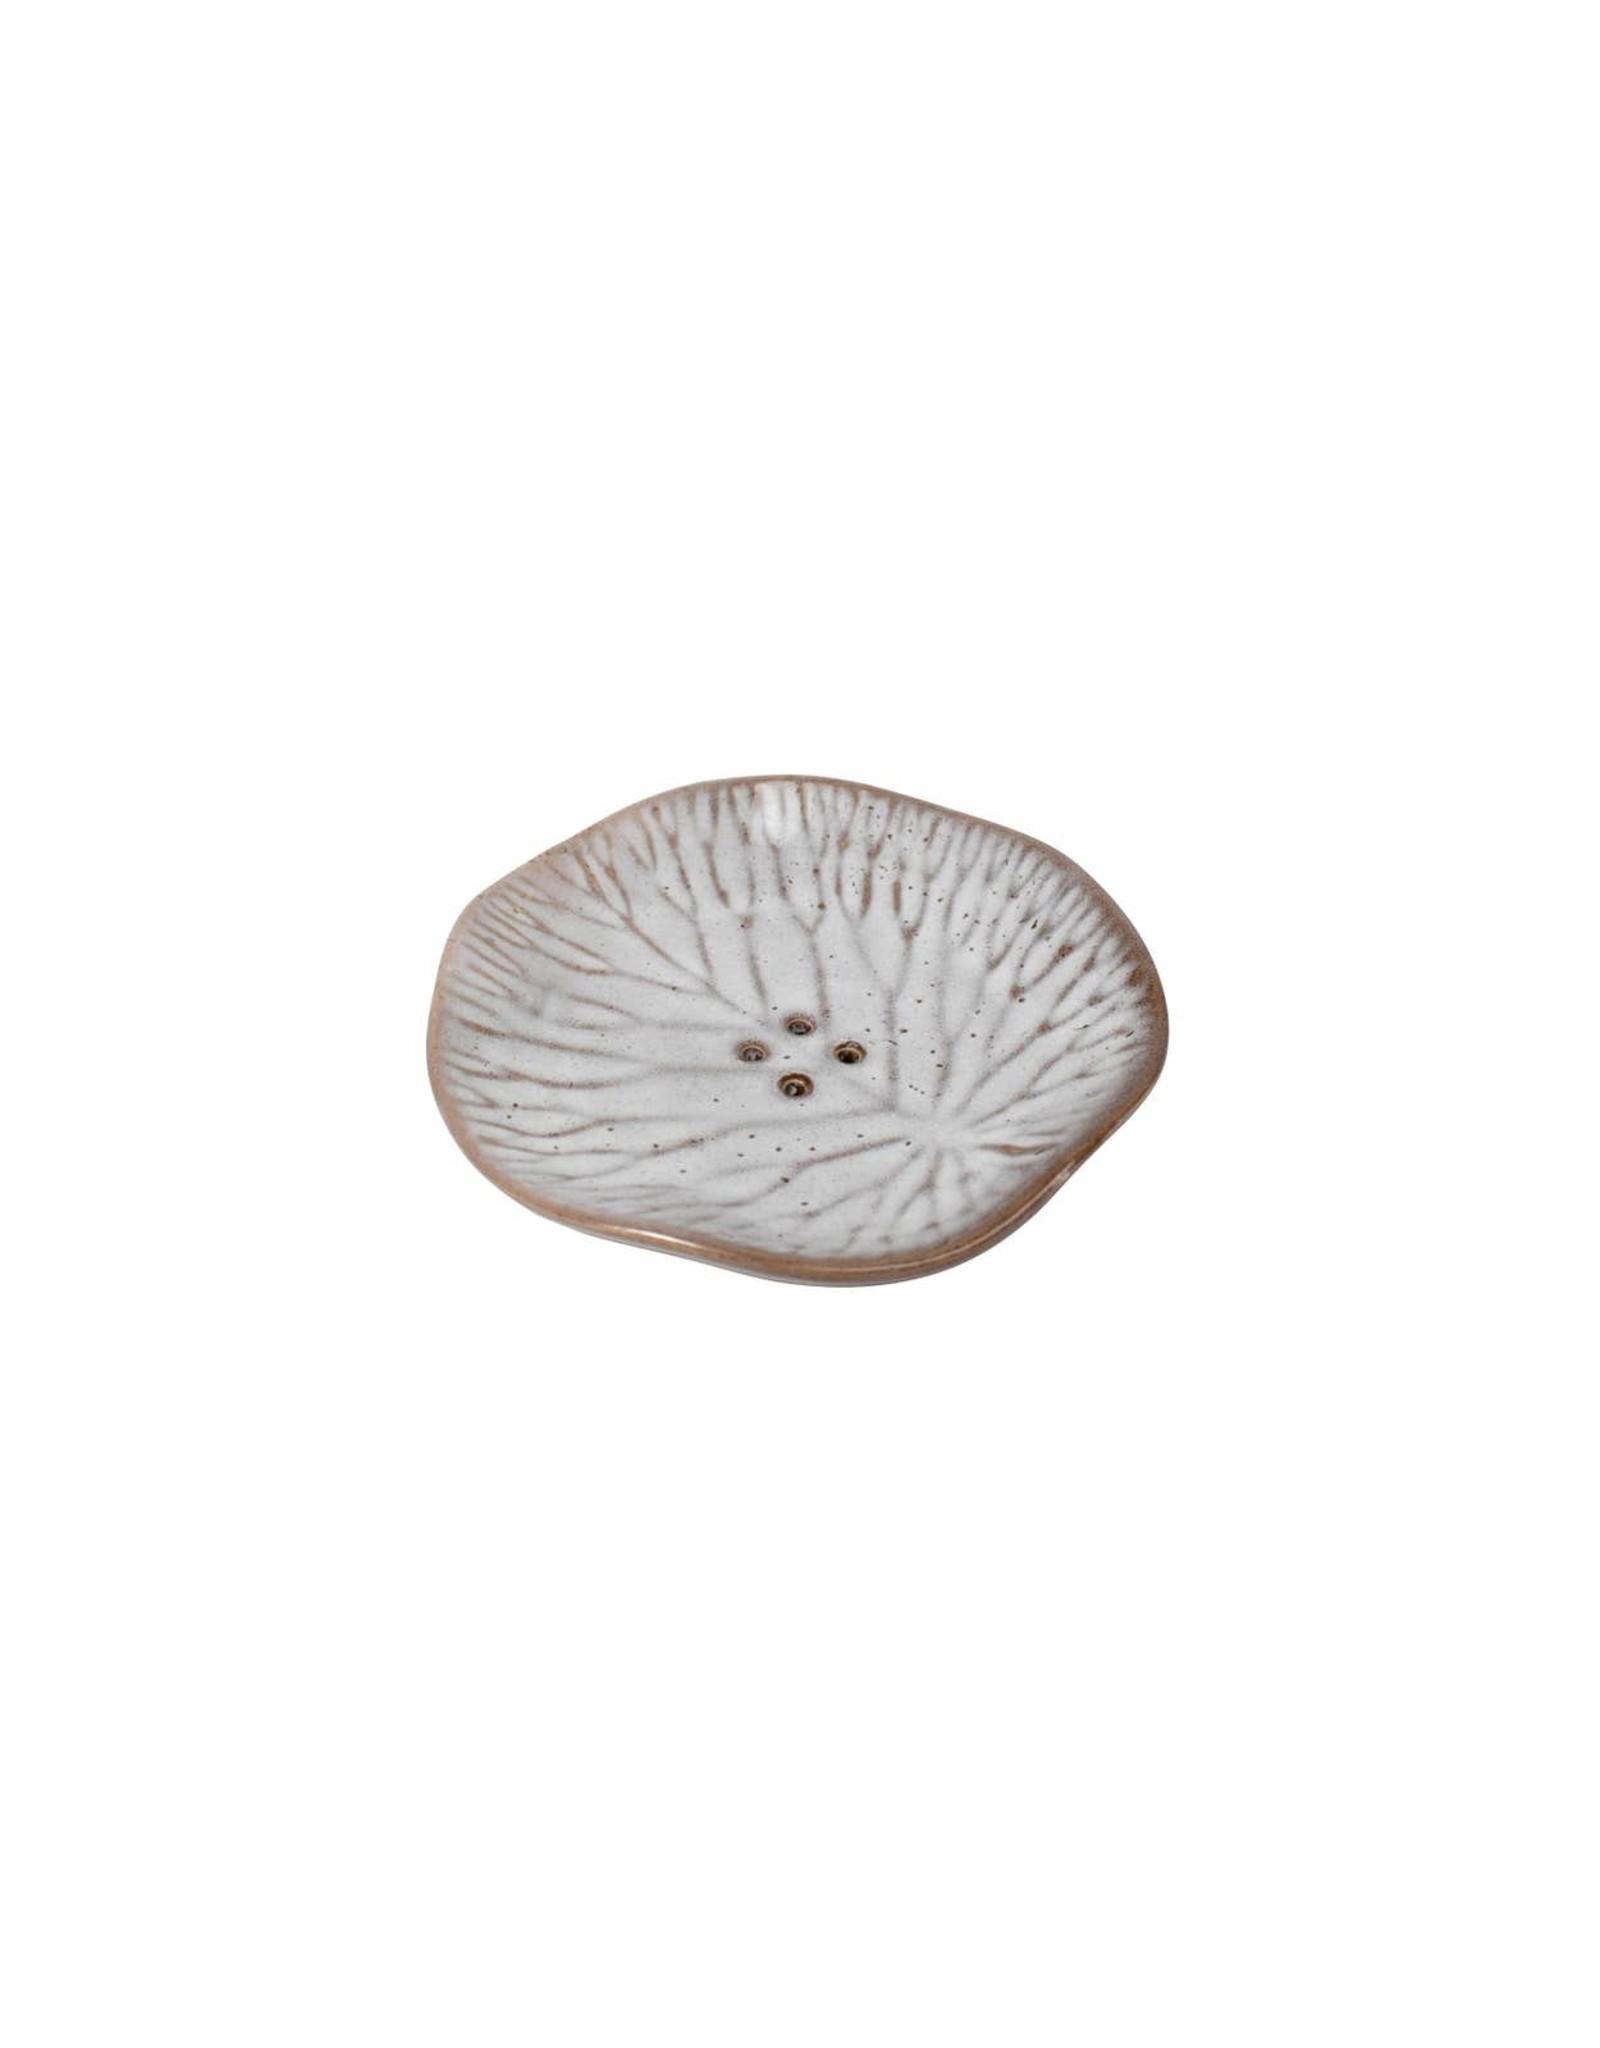 Ceramic Lily Pad Soap Dish, Indonesia